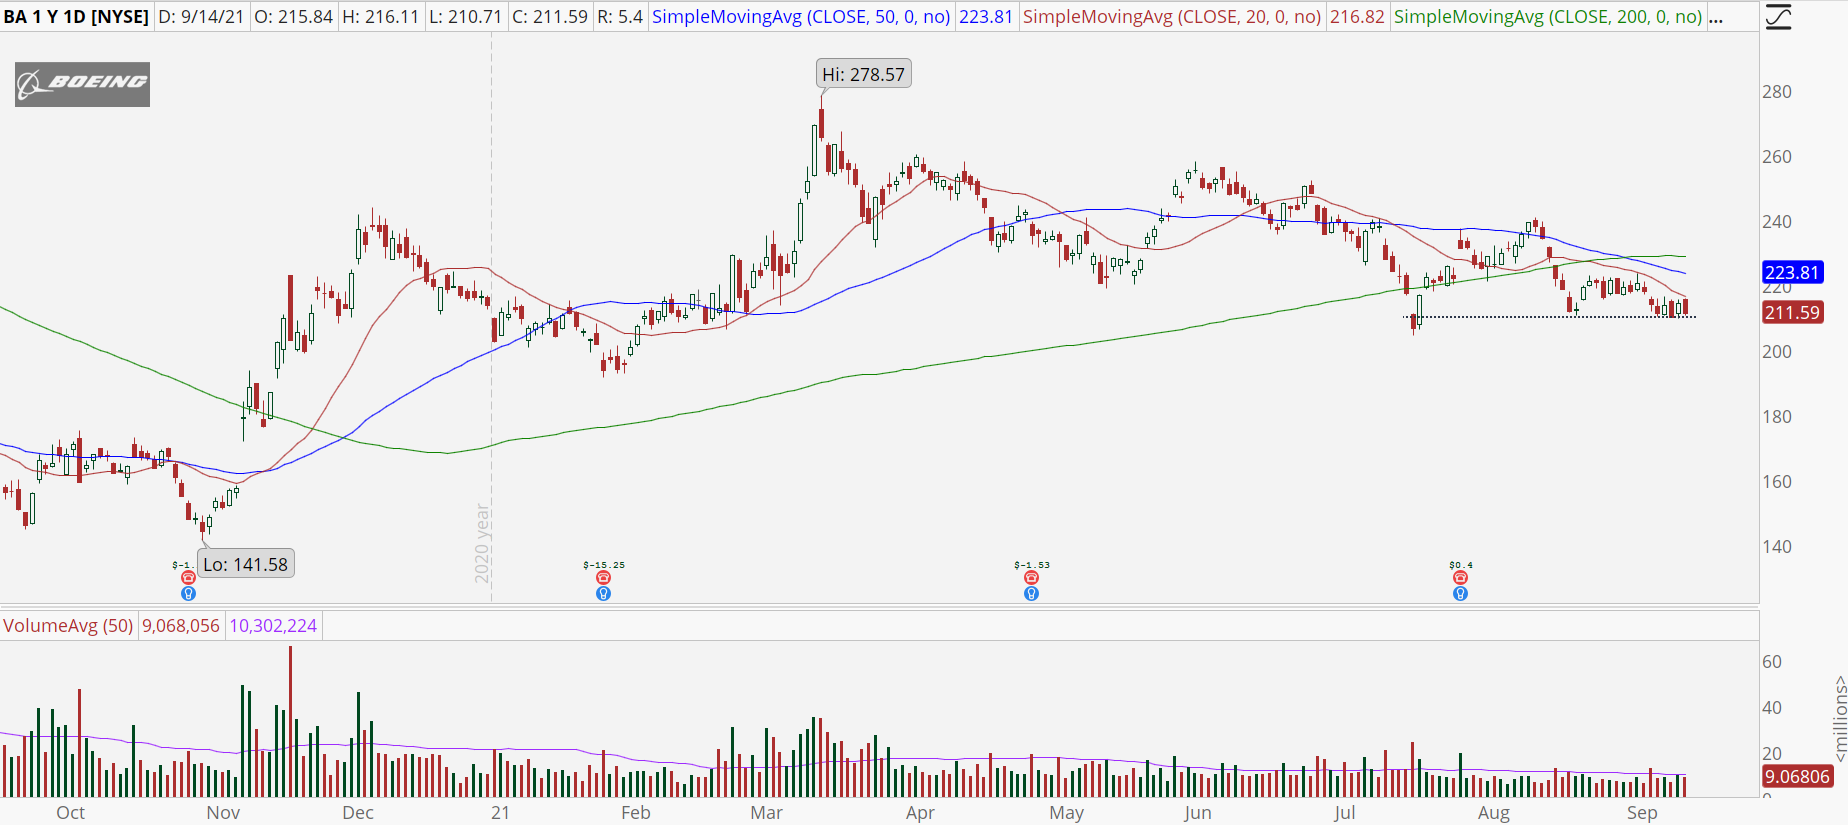 Boeing (BA) stock chart with bearish breakout